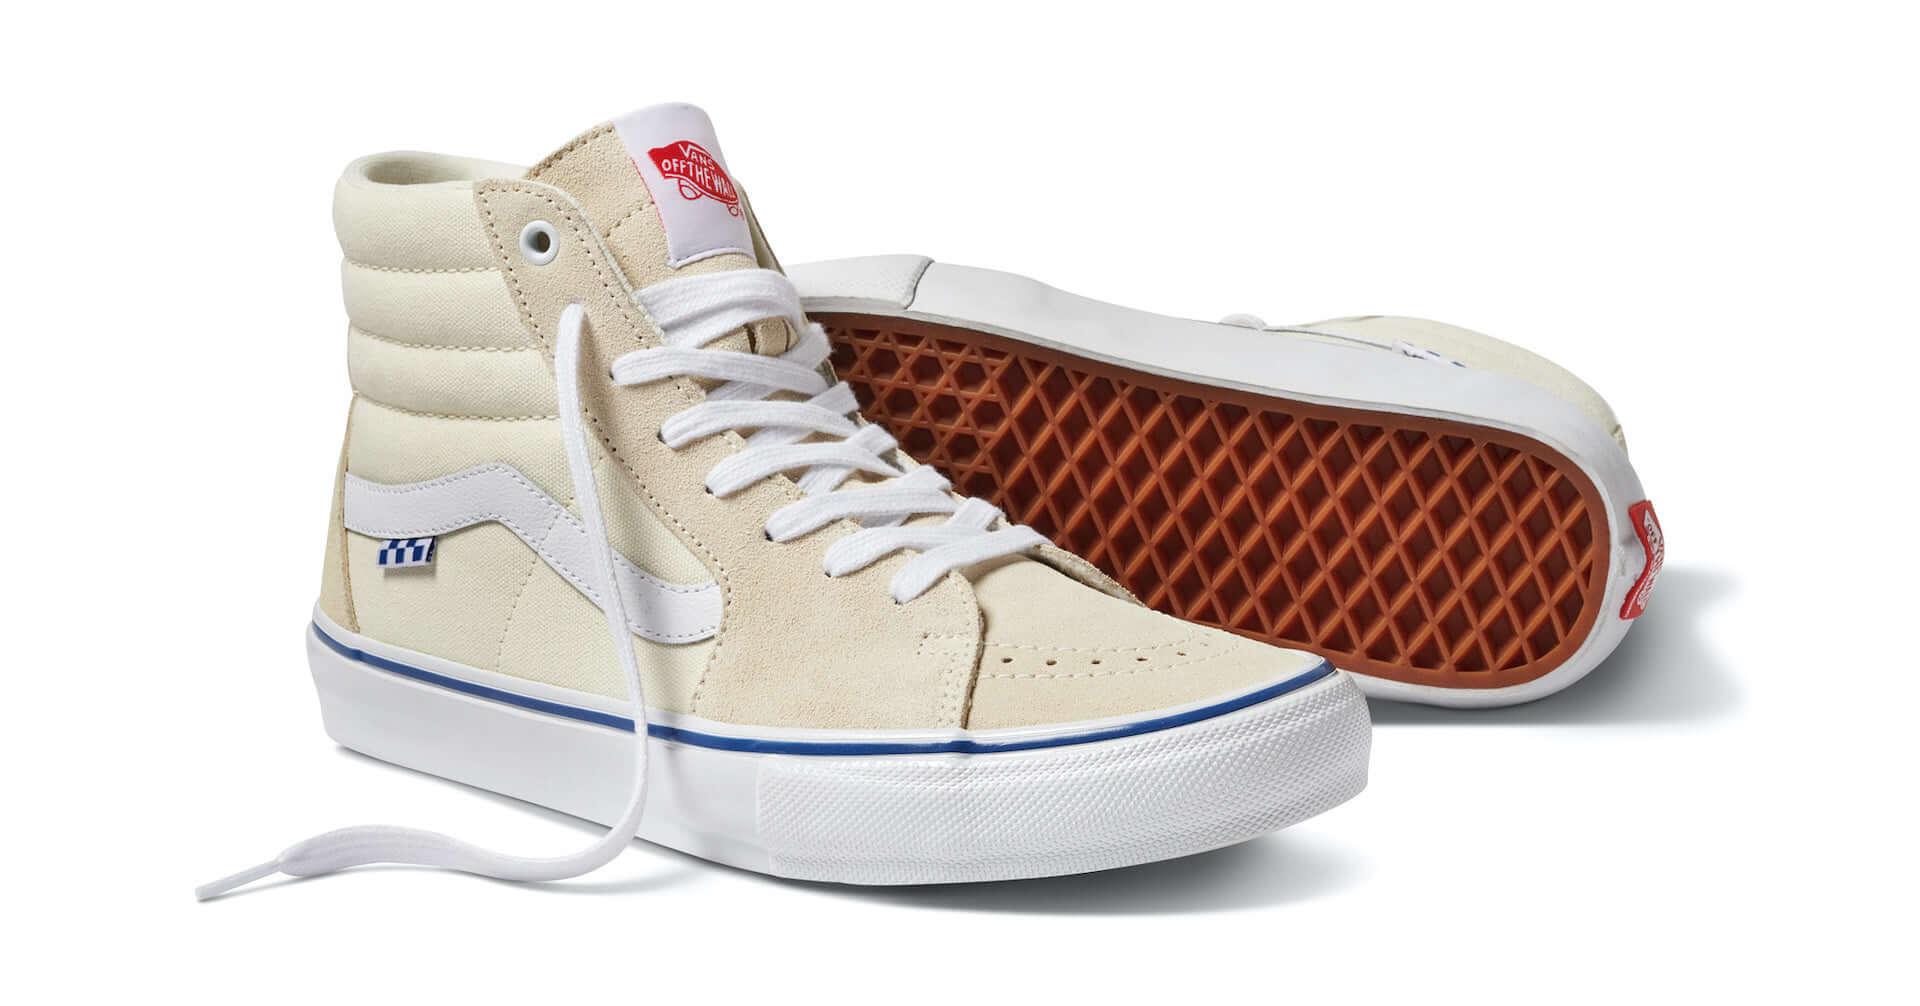 "VANSがスケーターに向けた新コレクション「Skate Classics」を発表!""全てが新しくなった""素材・構造に注目 lf210304_vans_12-1920x1006"